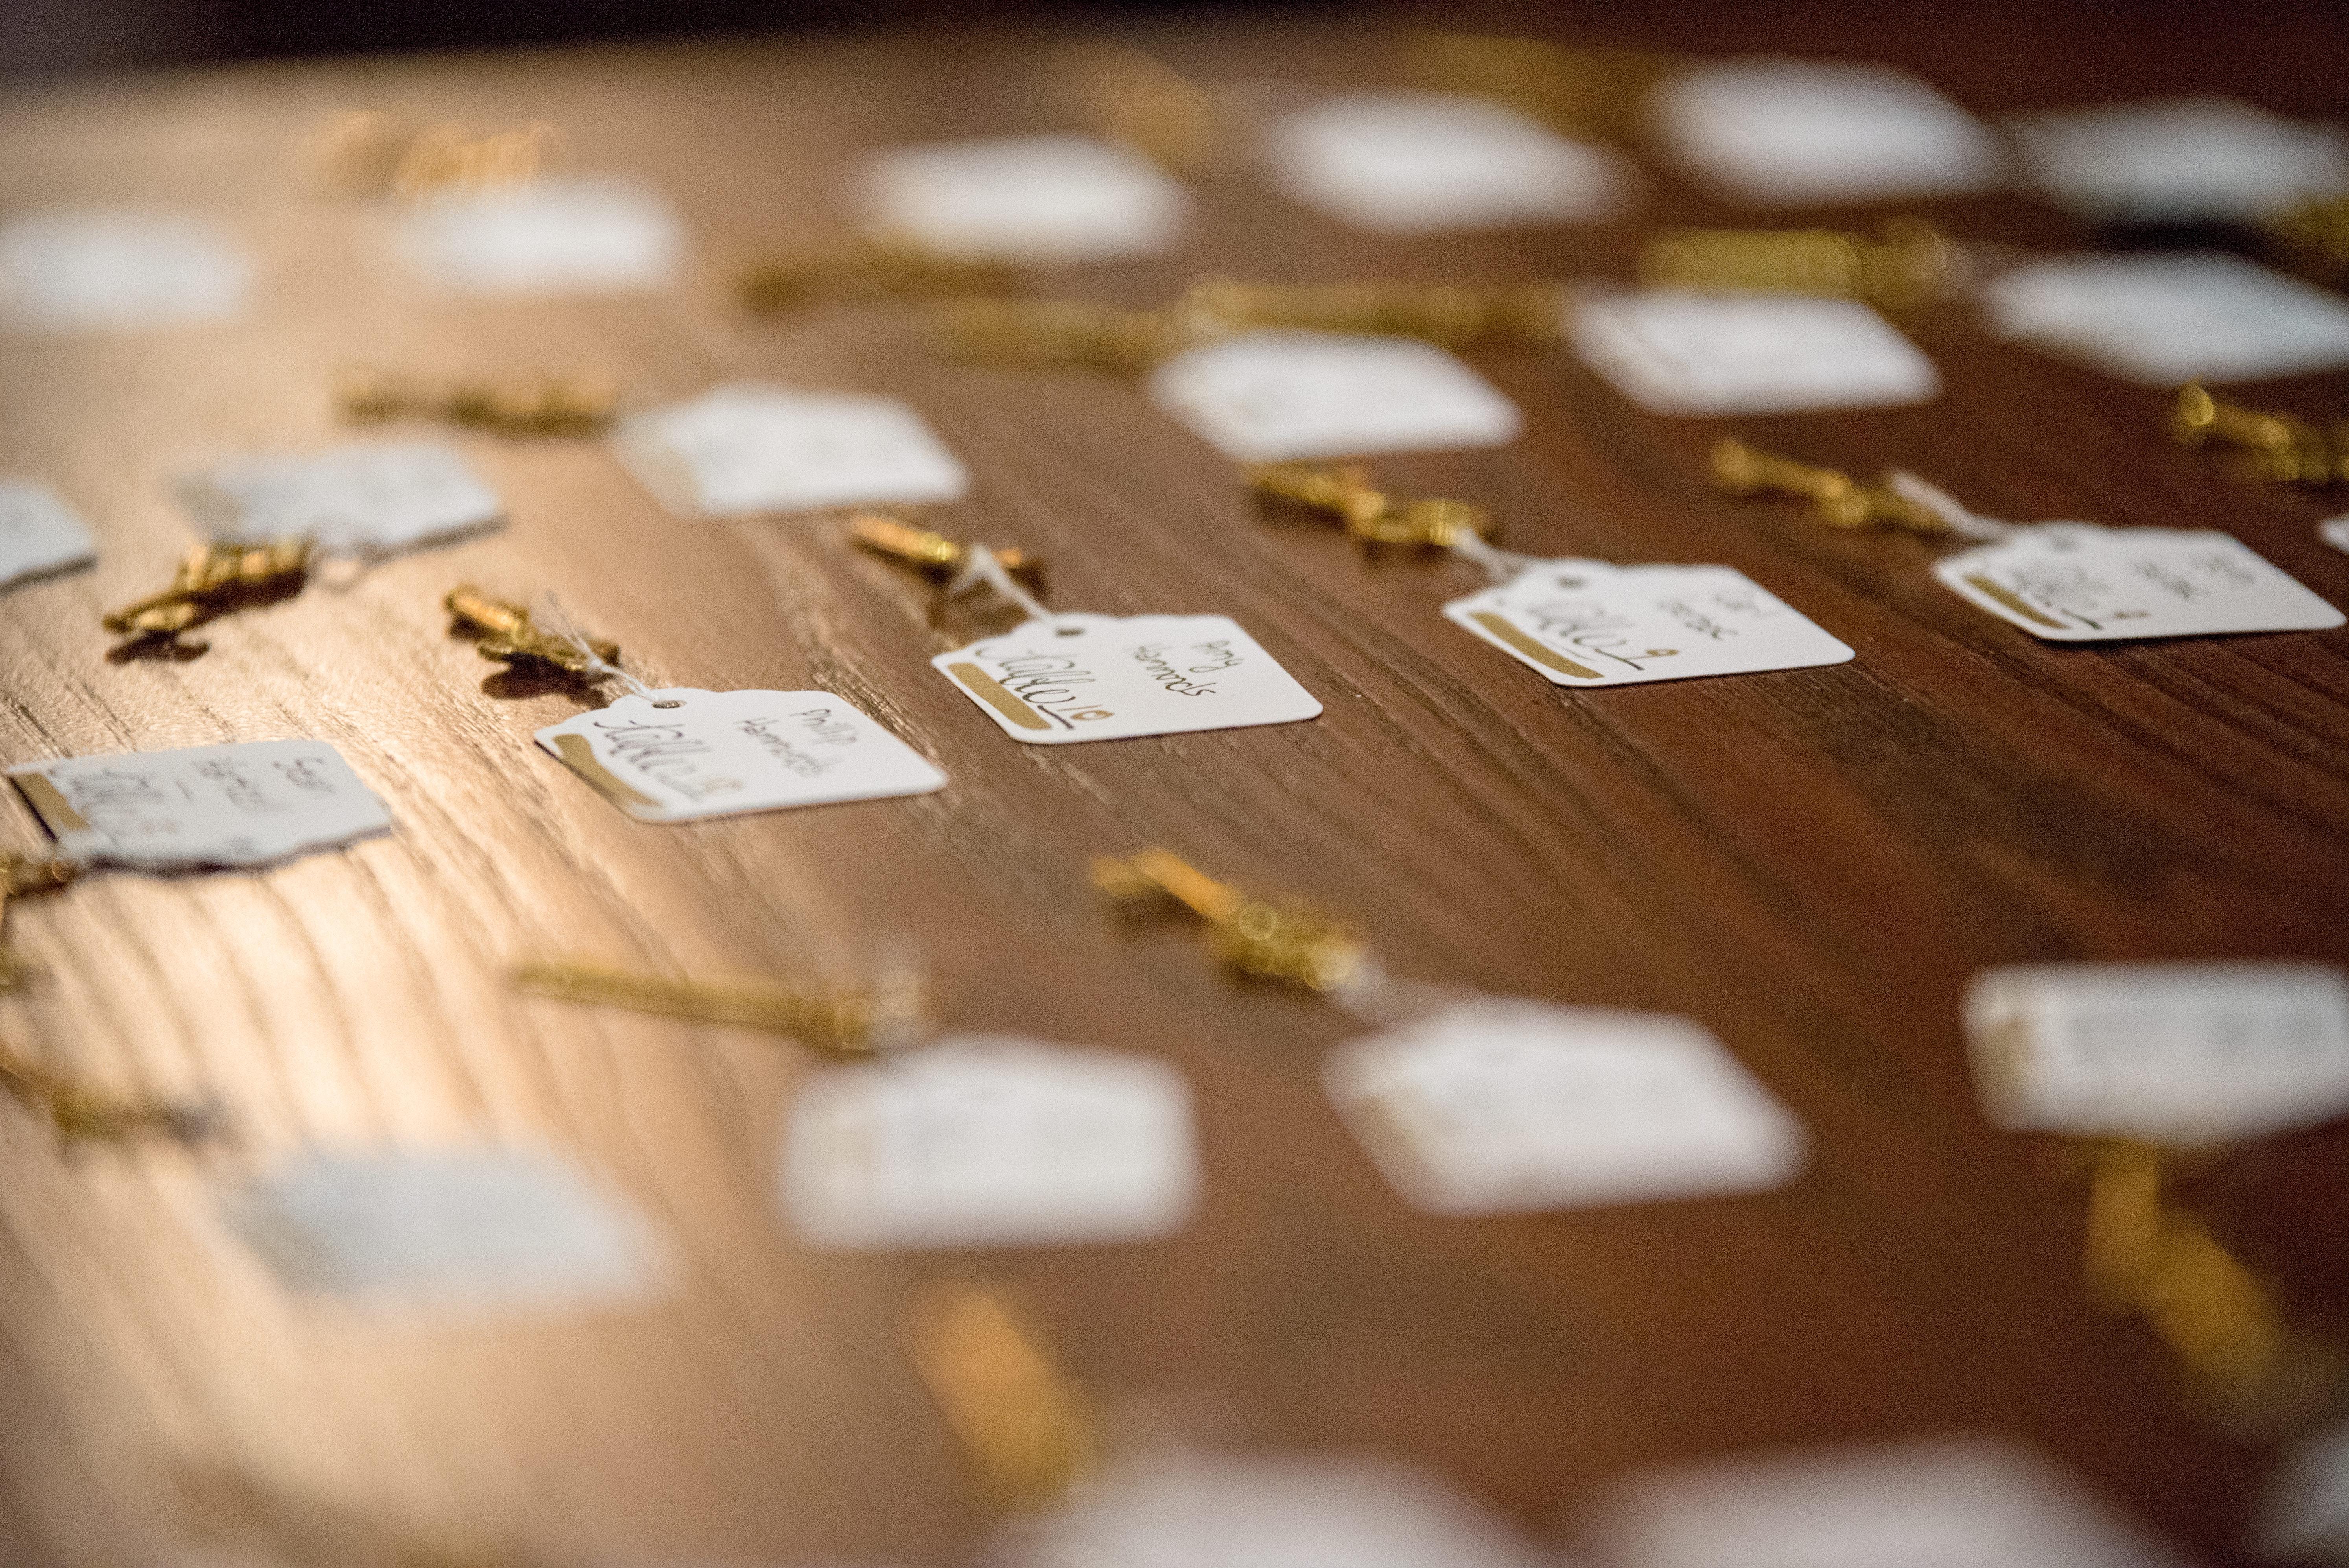 Immagini Belle Sfocatura D Oro Chiavi Carta